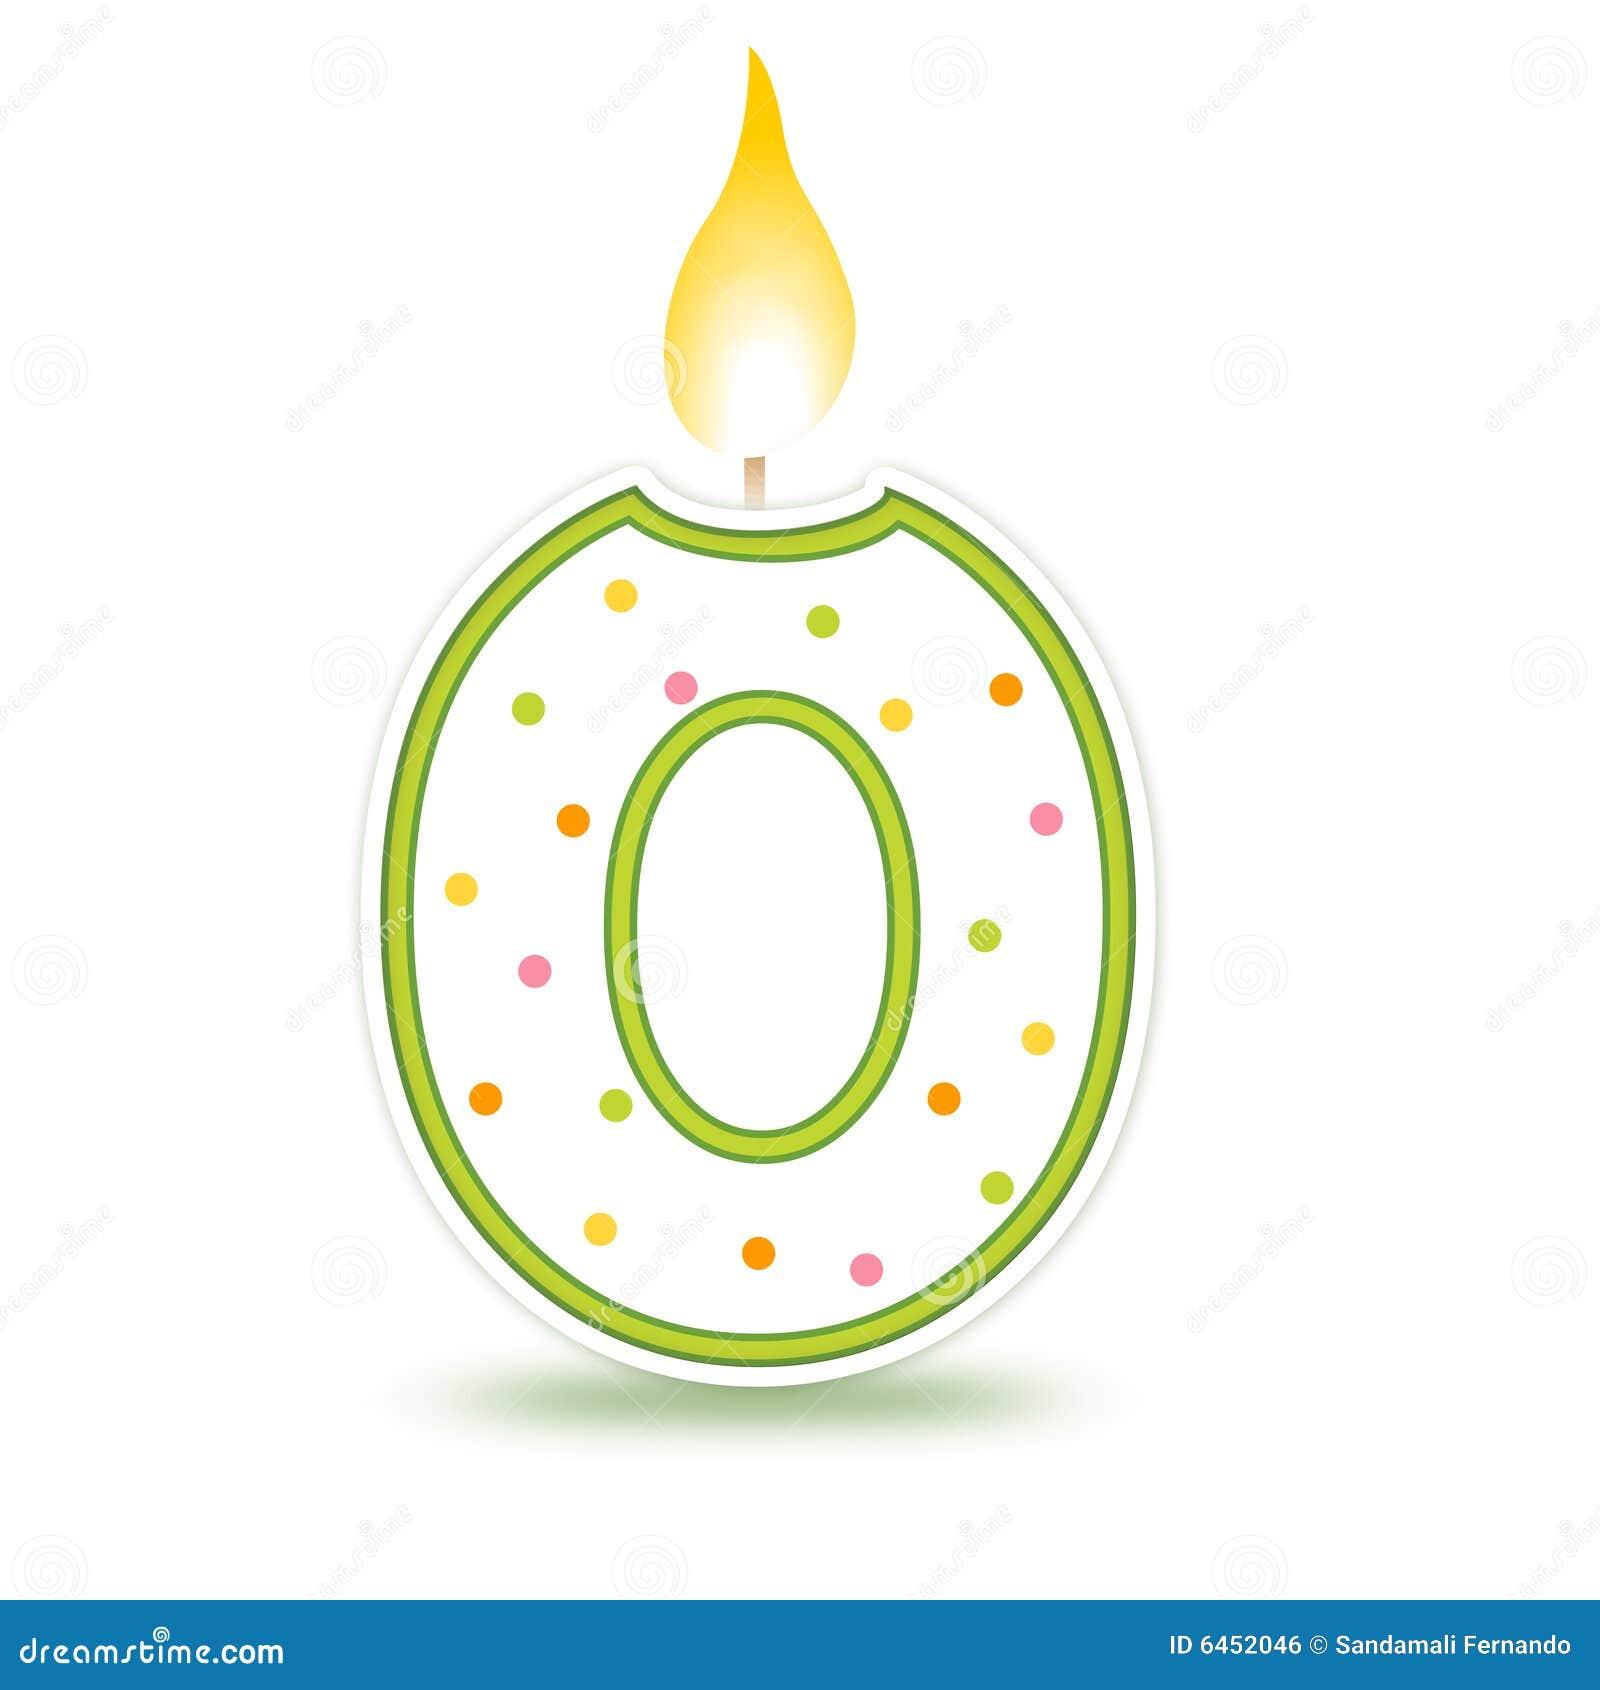 Filename: birthday-candle-0-6452046.jpg